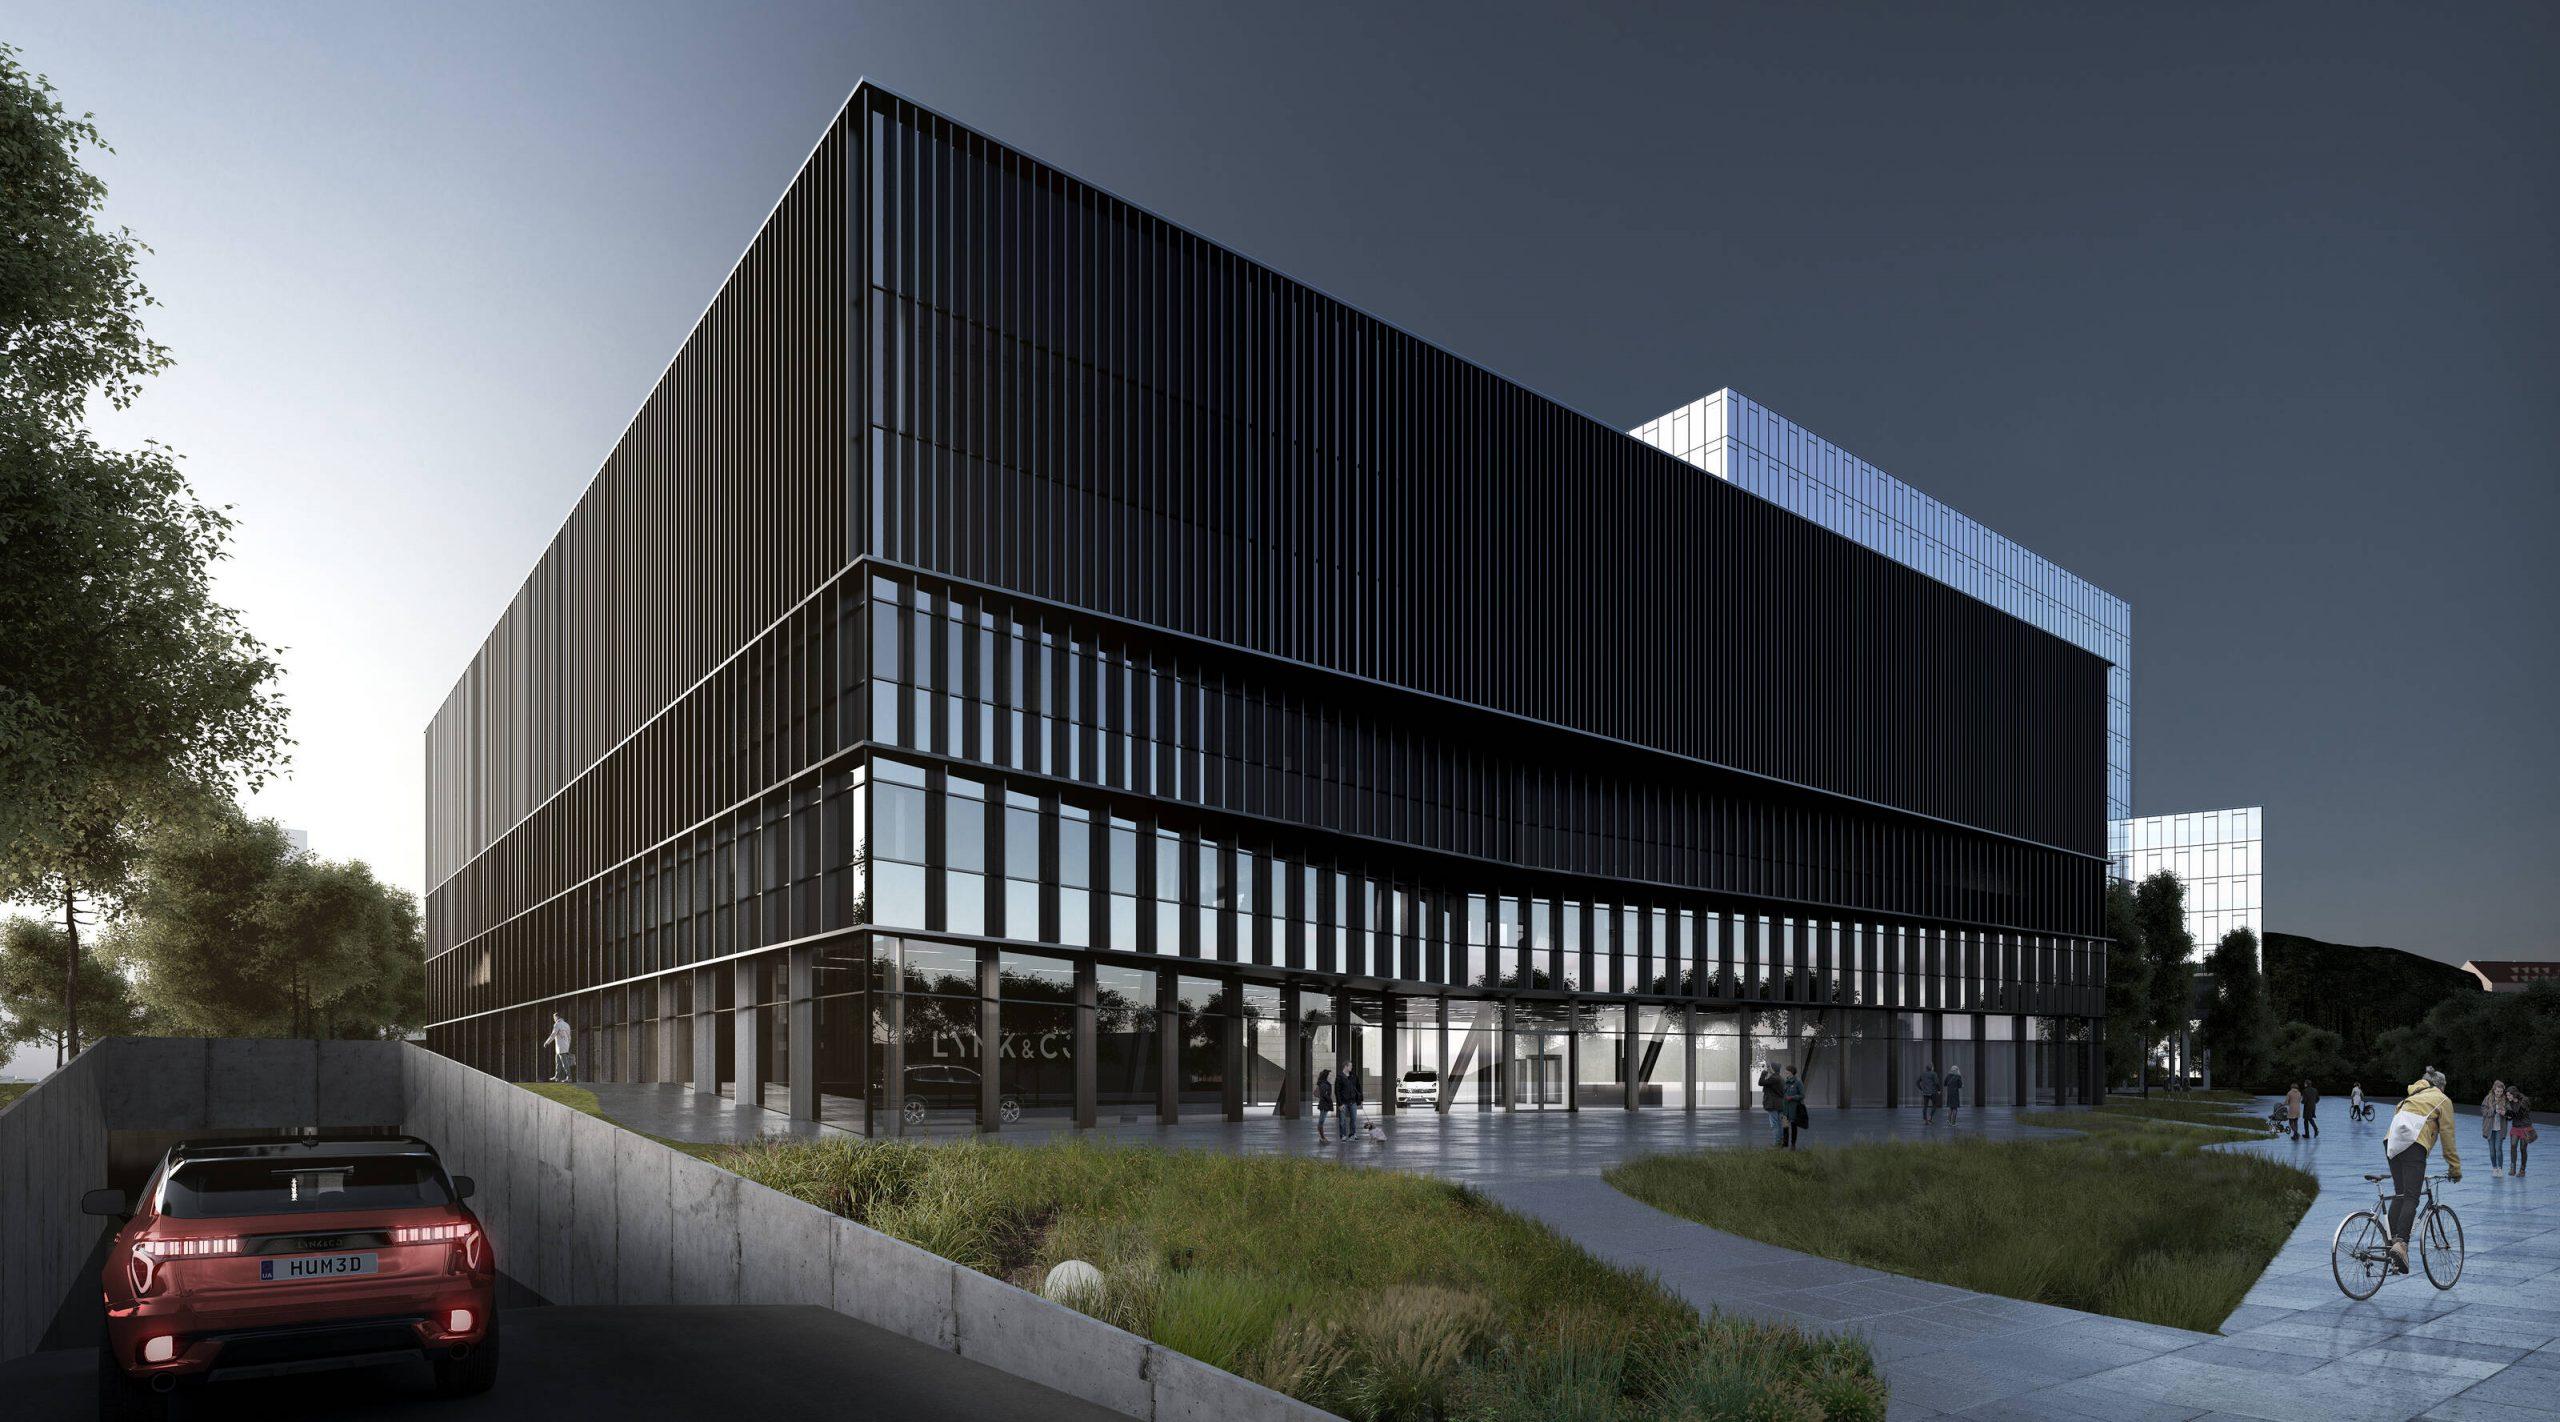 Geely Design Centre